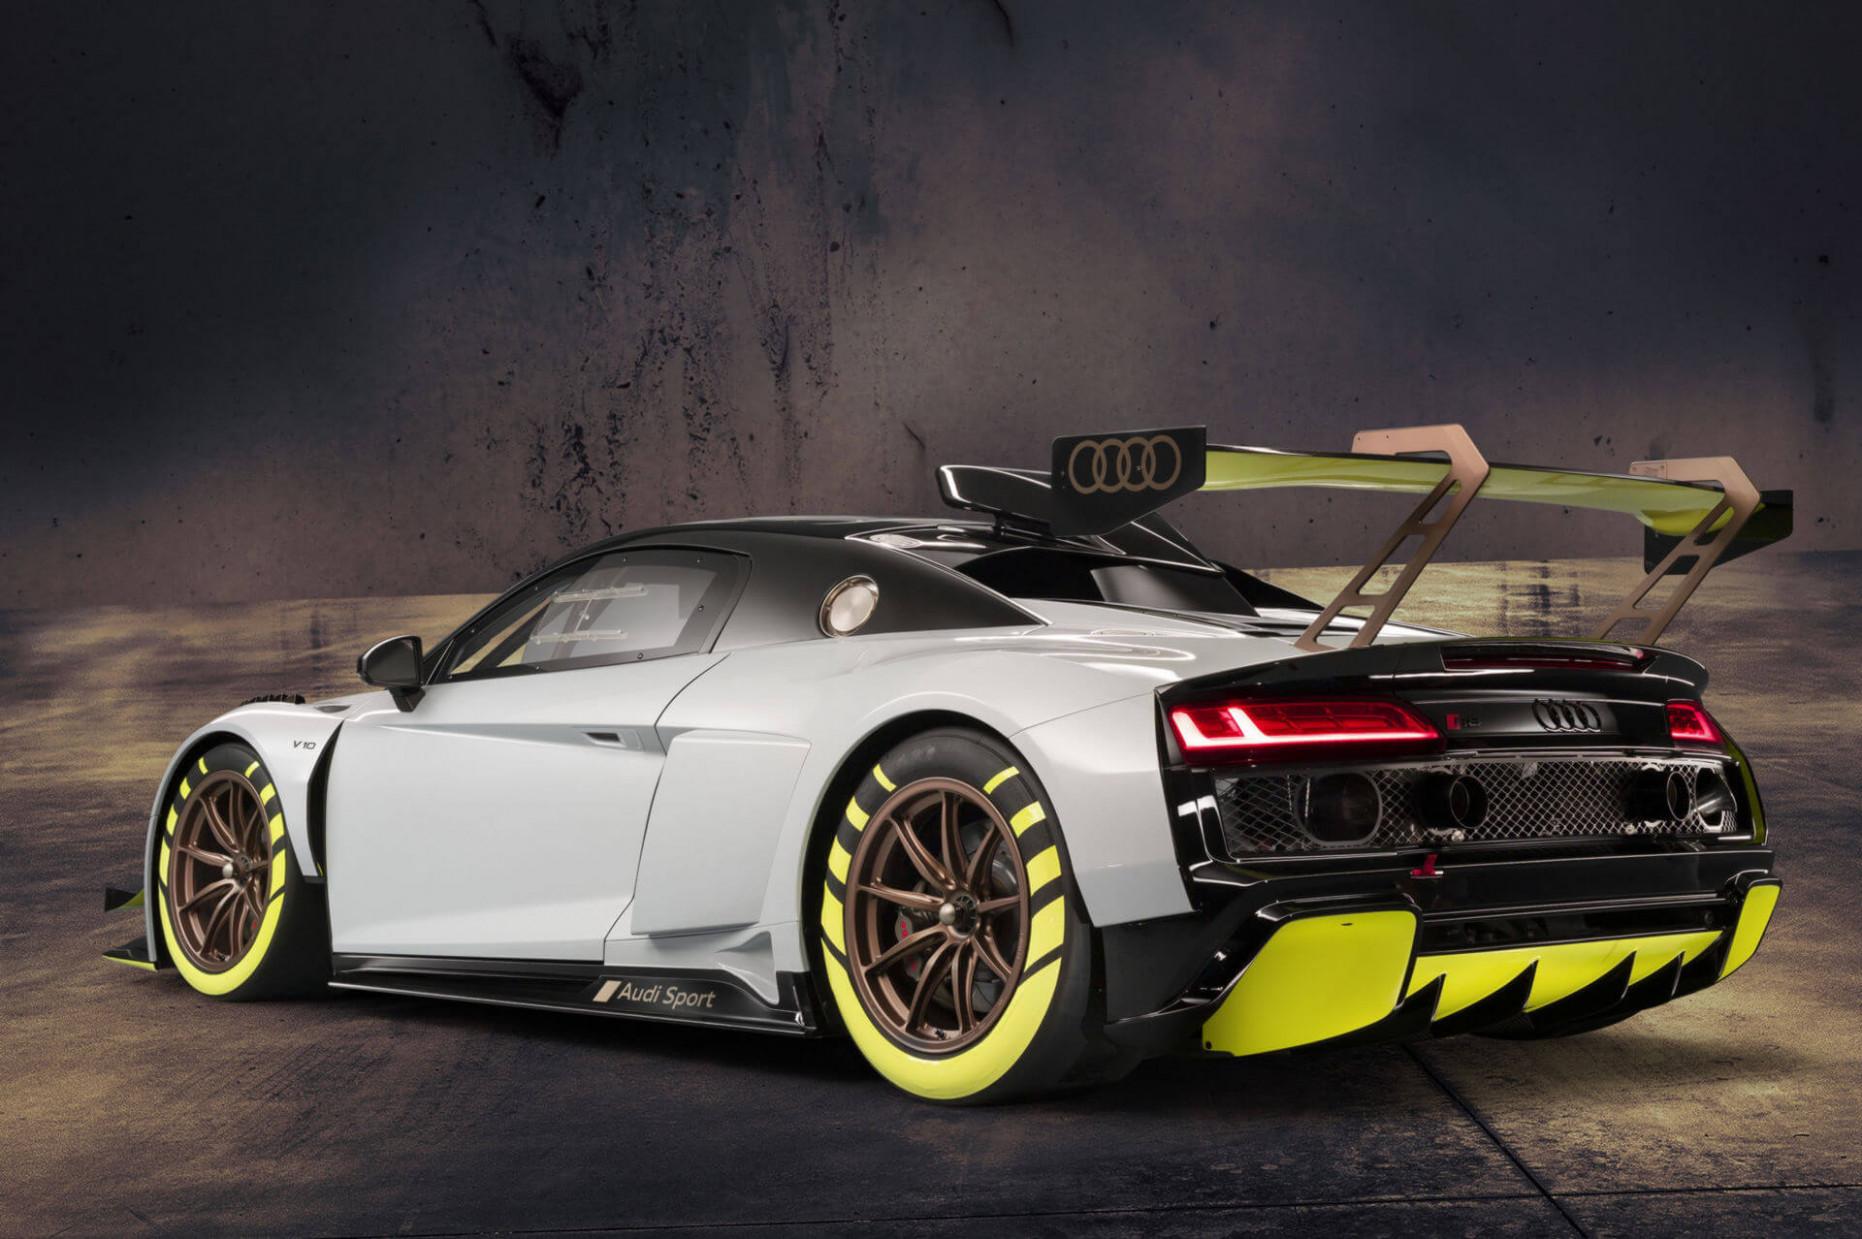 Engine 2022 Audi R8 LMXs